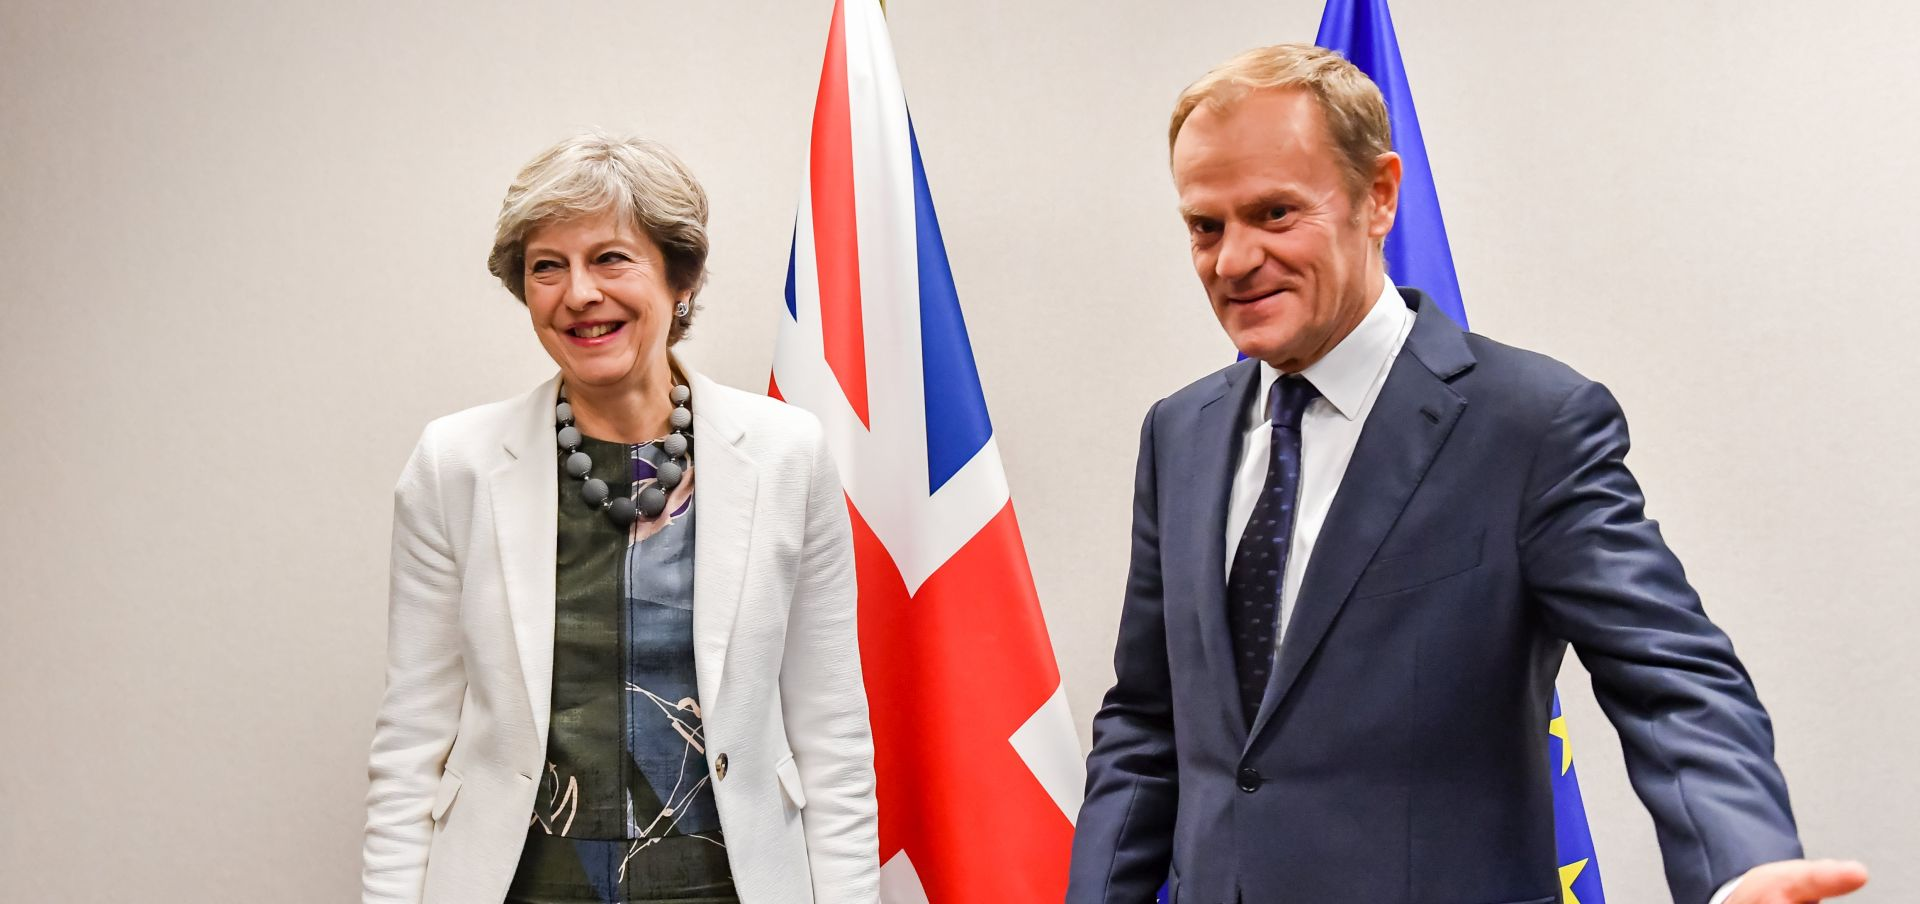 May ponovila da je spremna ispuniti financijske obveze, EU očekuje konkretne brojke